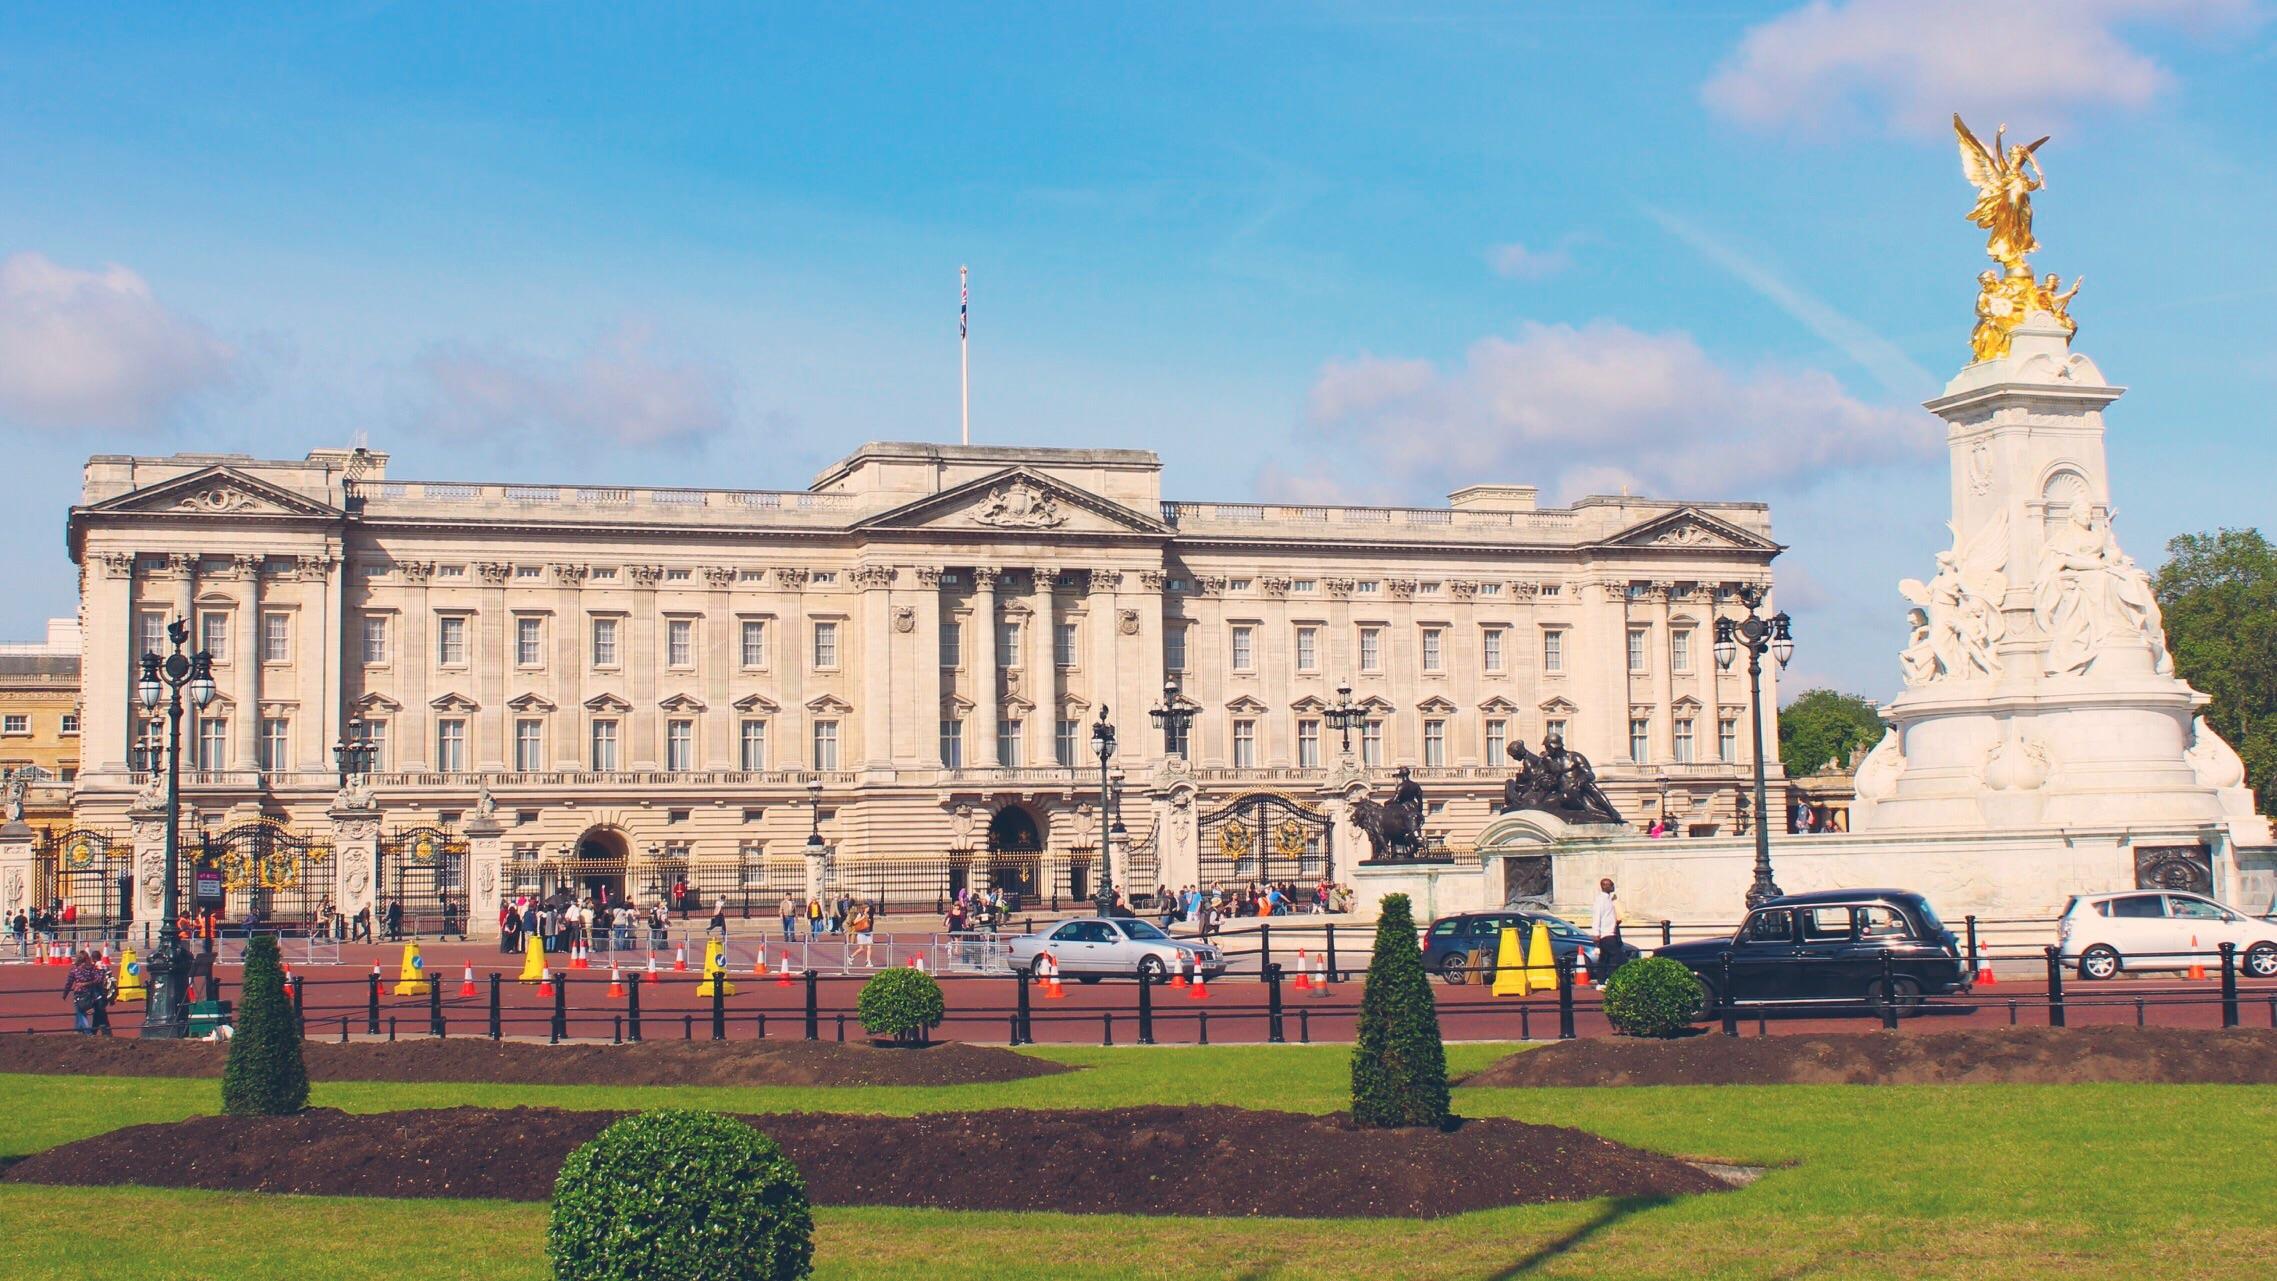 A mega European tour ends in London